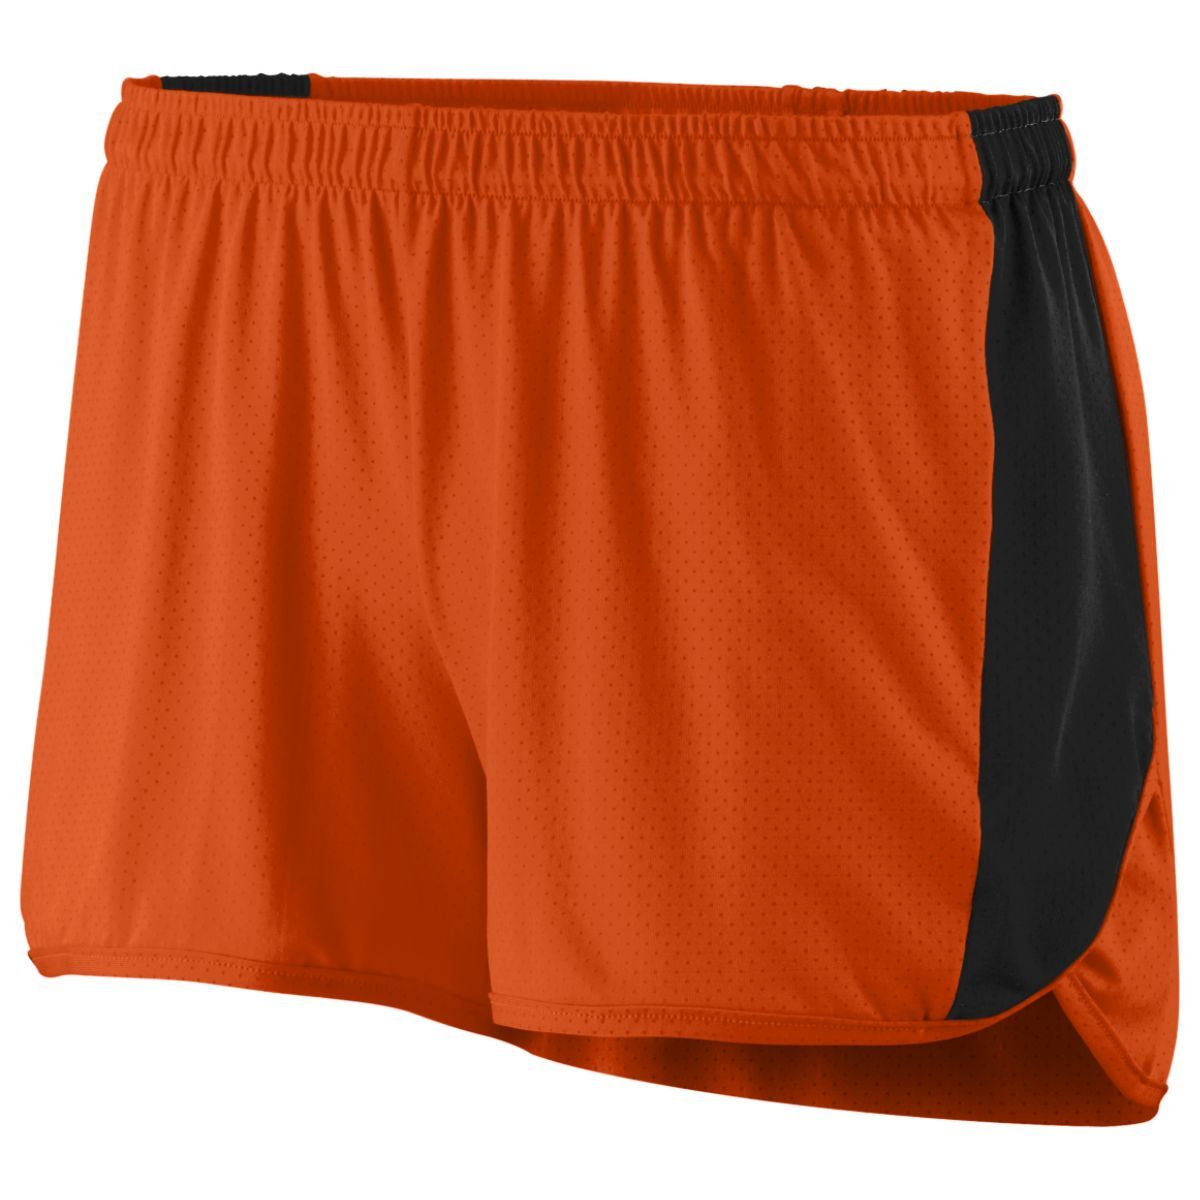 Ladies Sprint Shorts - ORANGE/BLACK